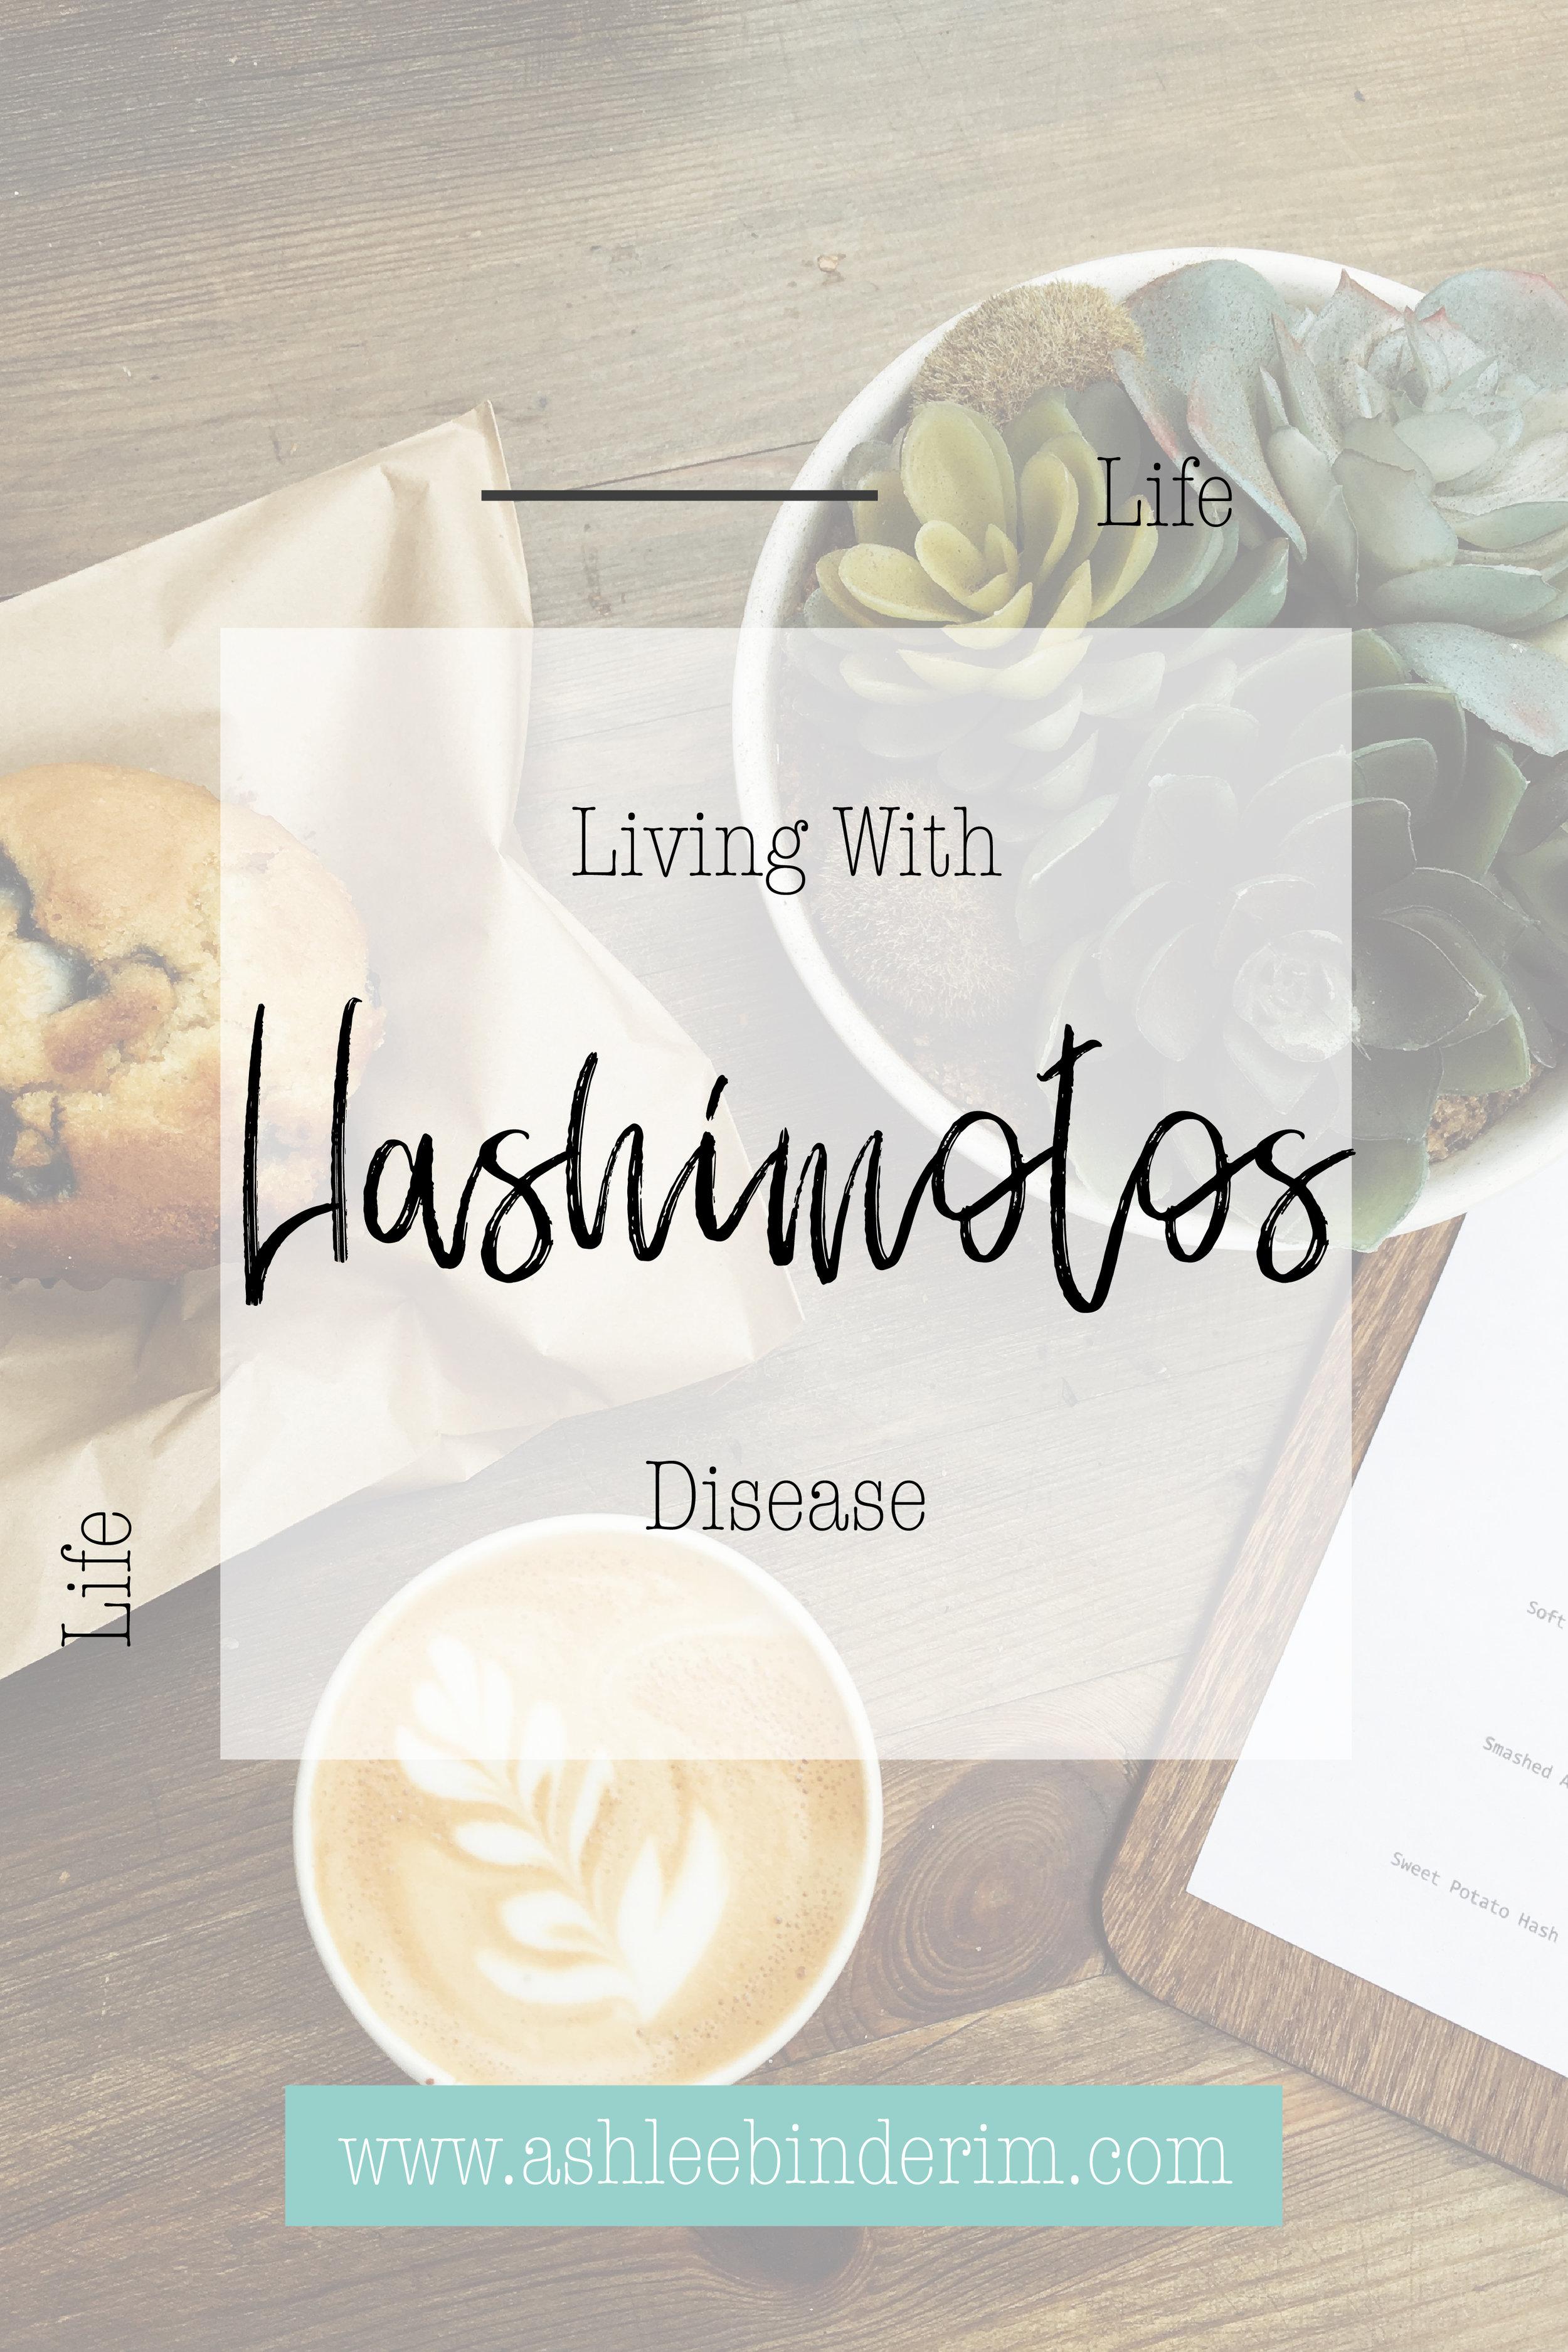 Living With Hashimoto's Disease